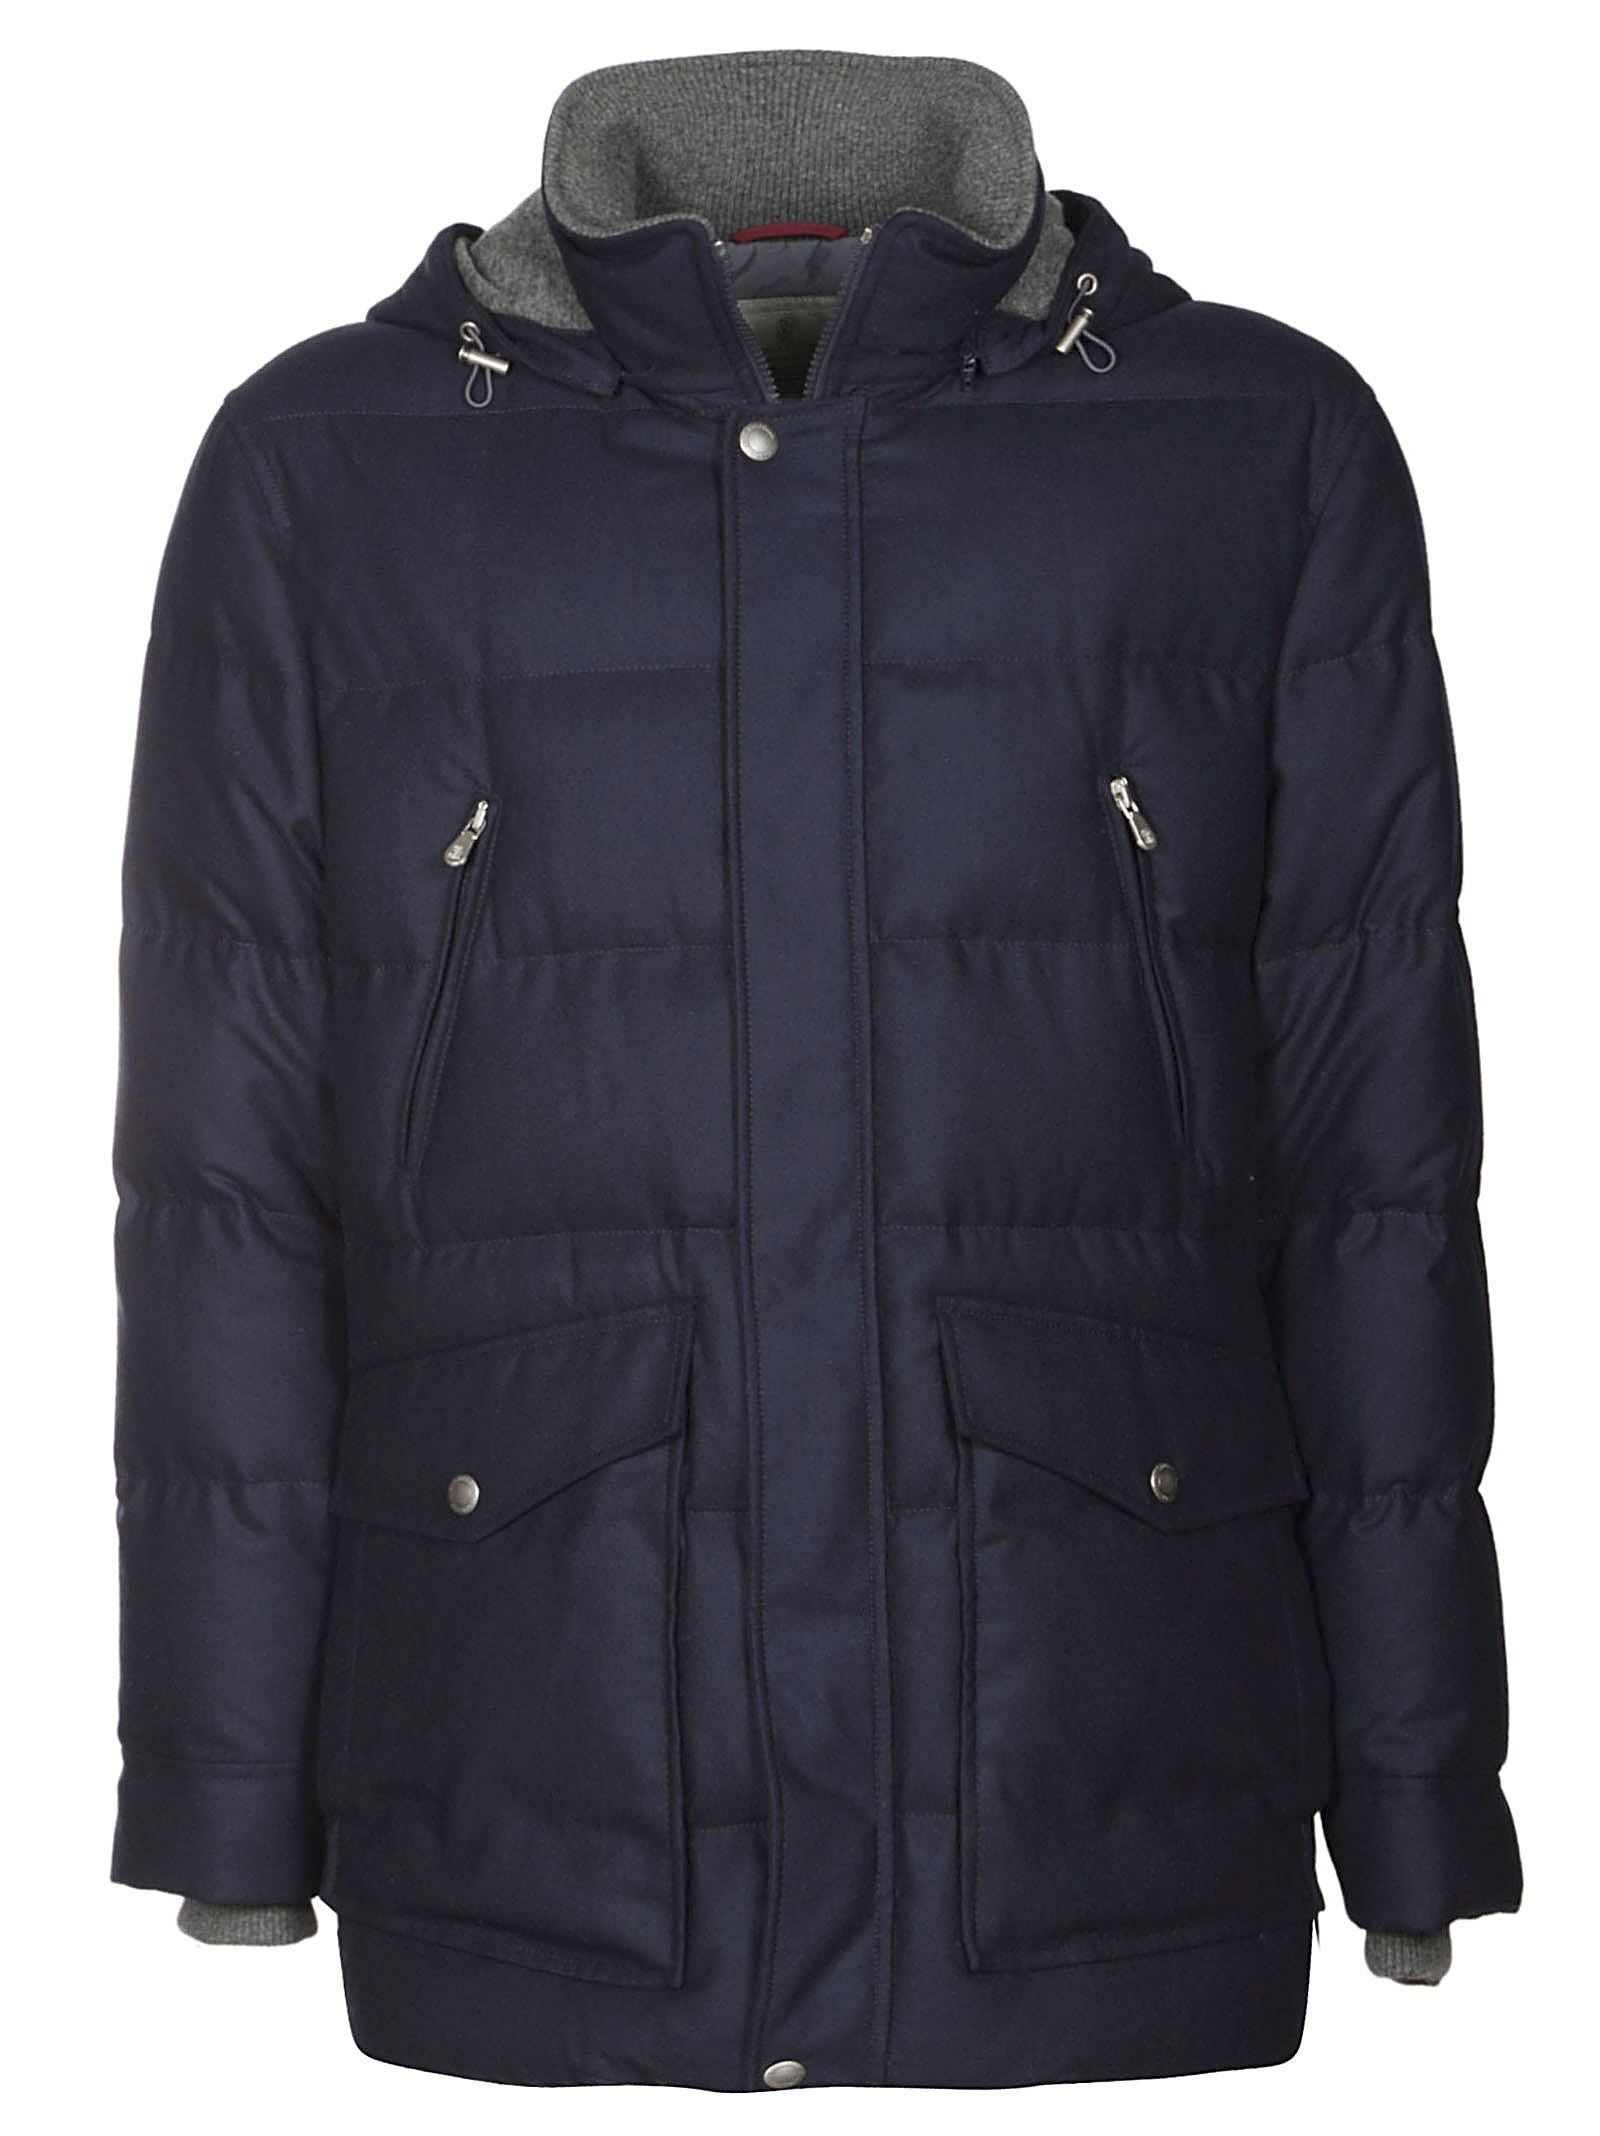 Brunello Cucinelli Buttoned Pocket Jacket